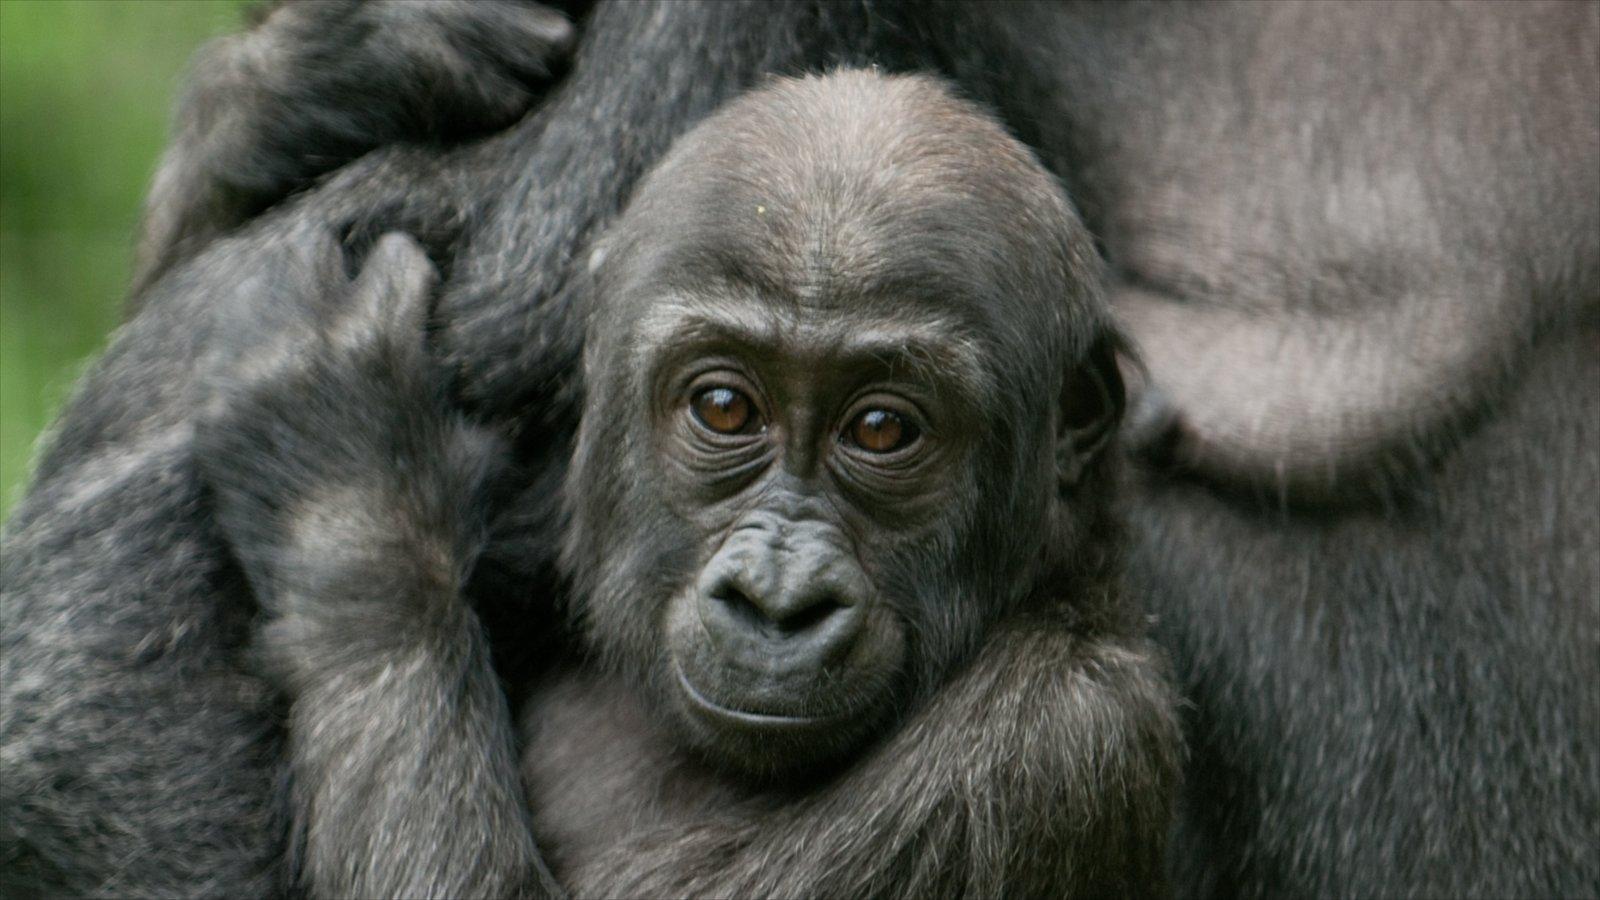 Columbus Zoo and Aquarium caracterizando animais fofos ou amigáveis, animais de zoológico e animais terrestres